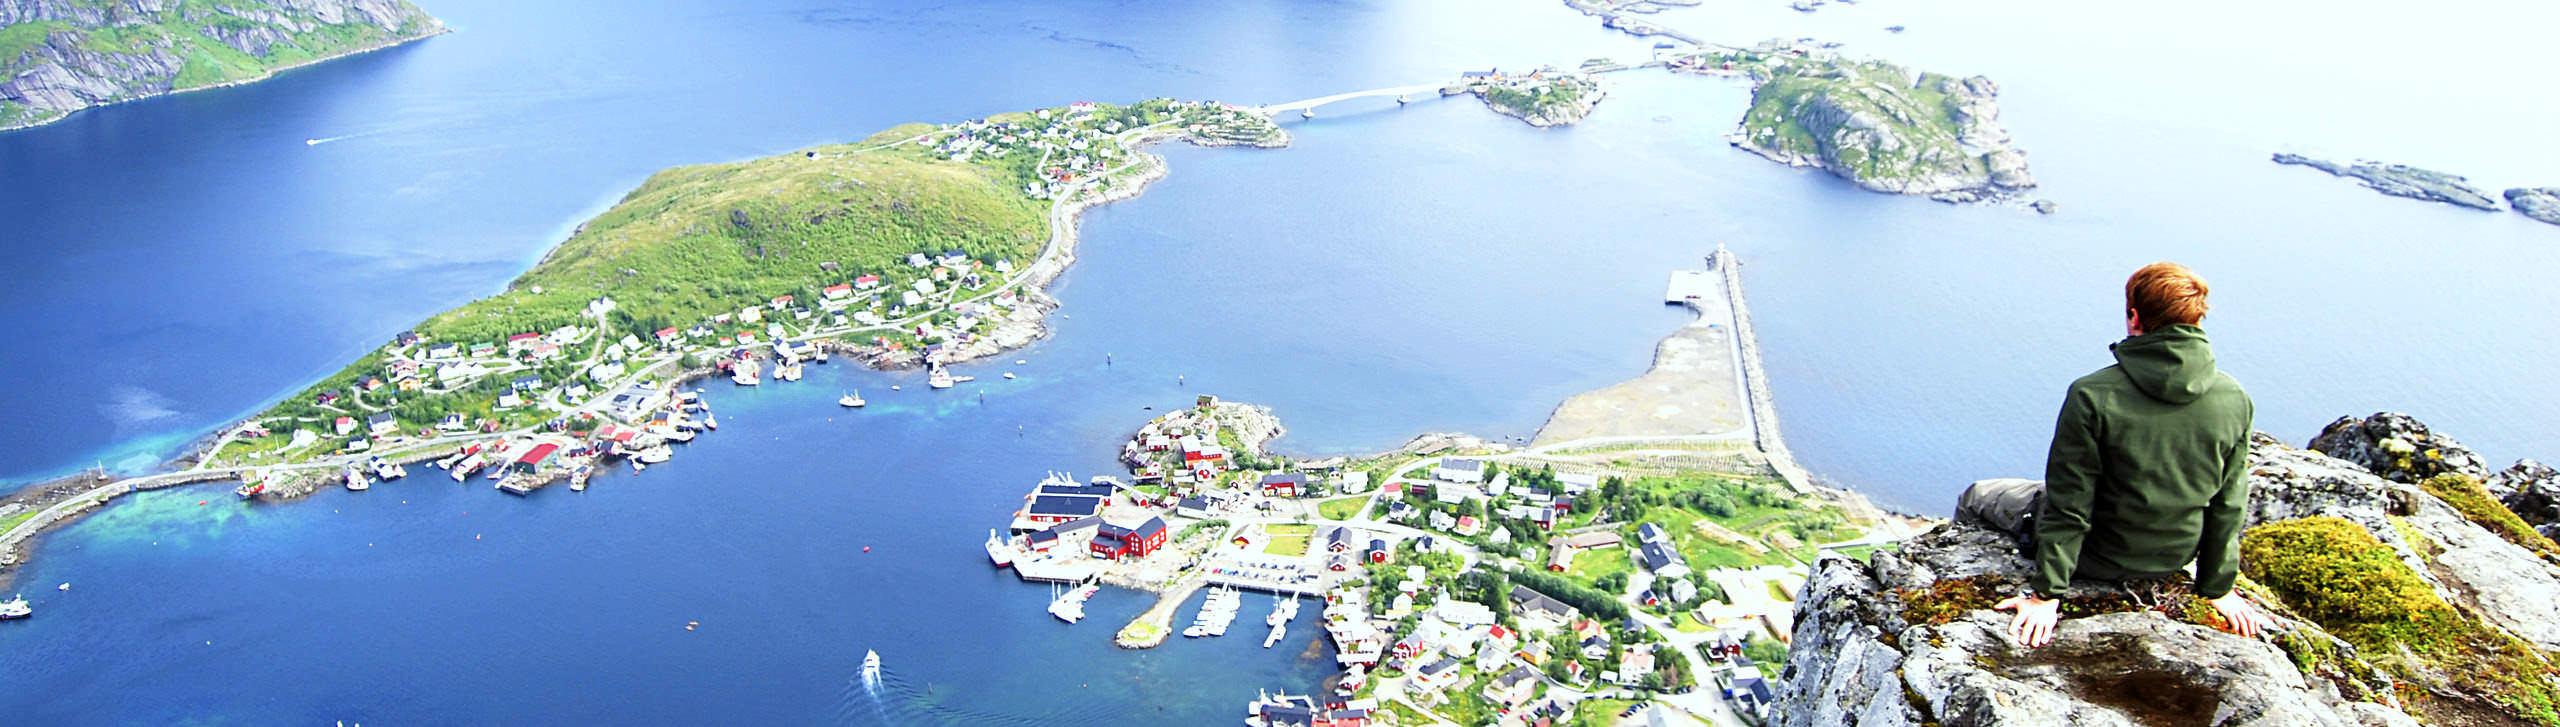 Lofoten Islands Tour